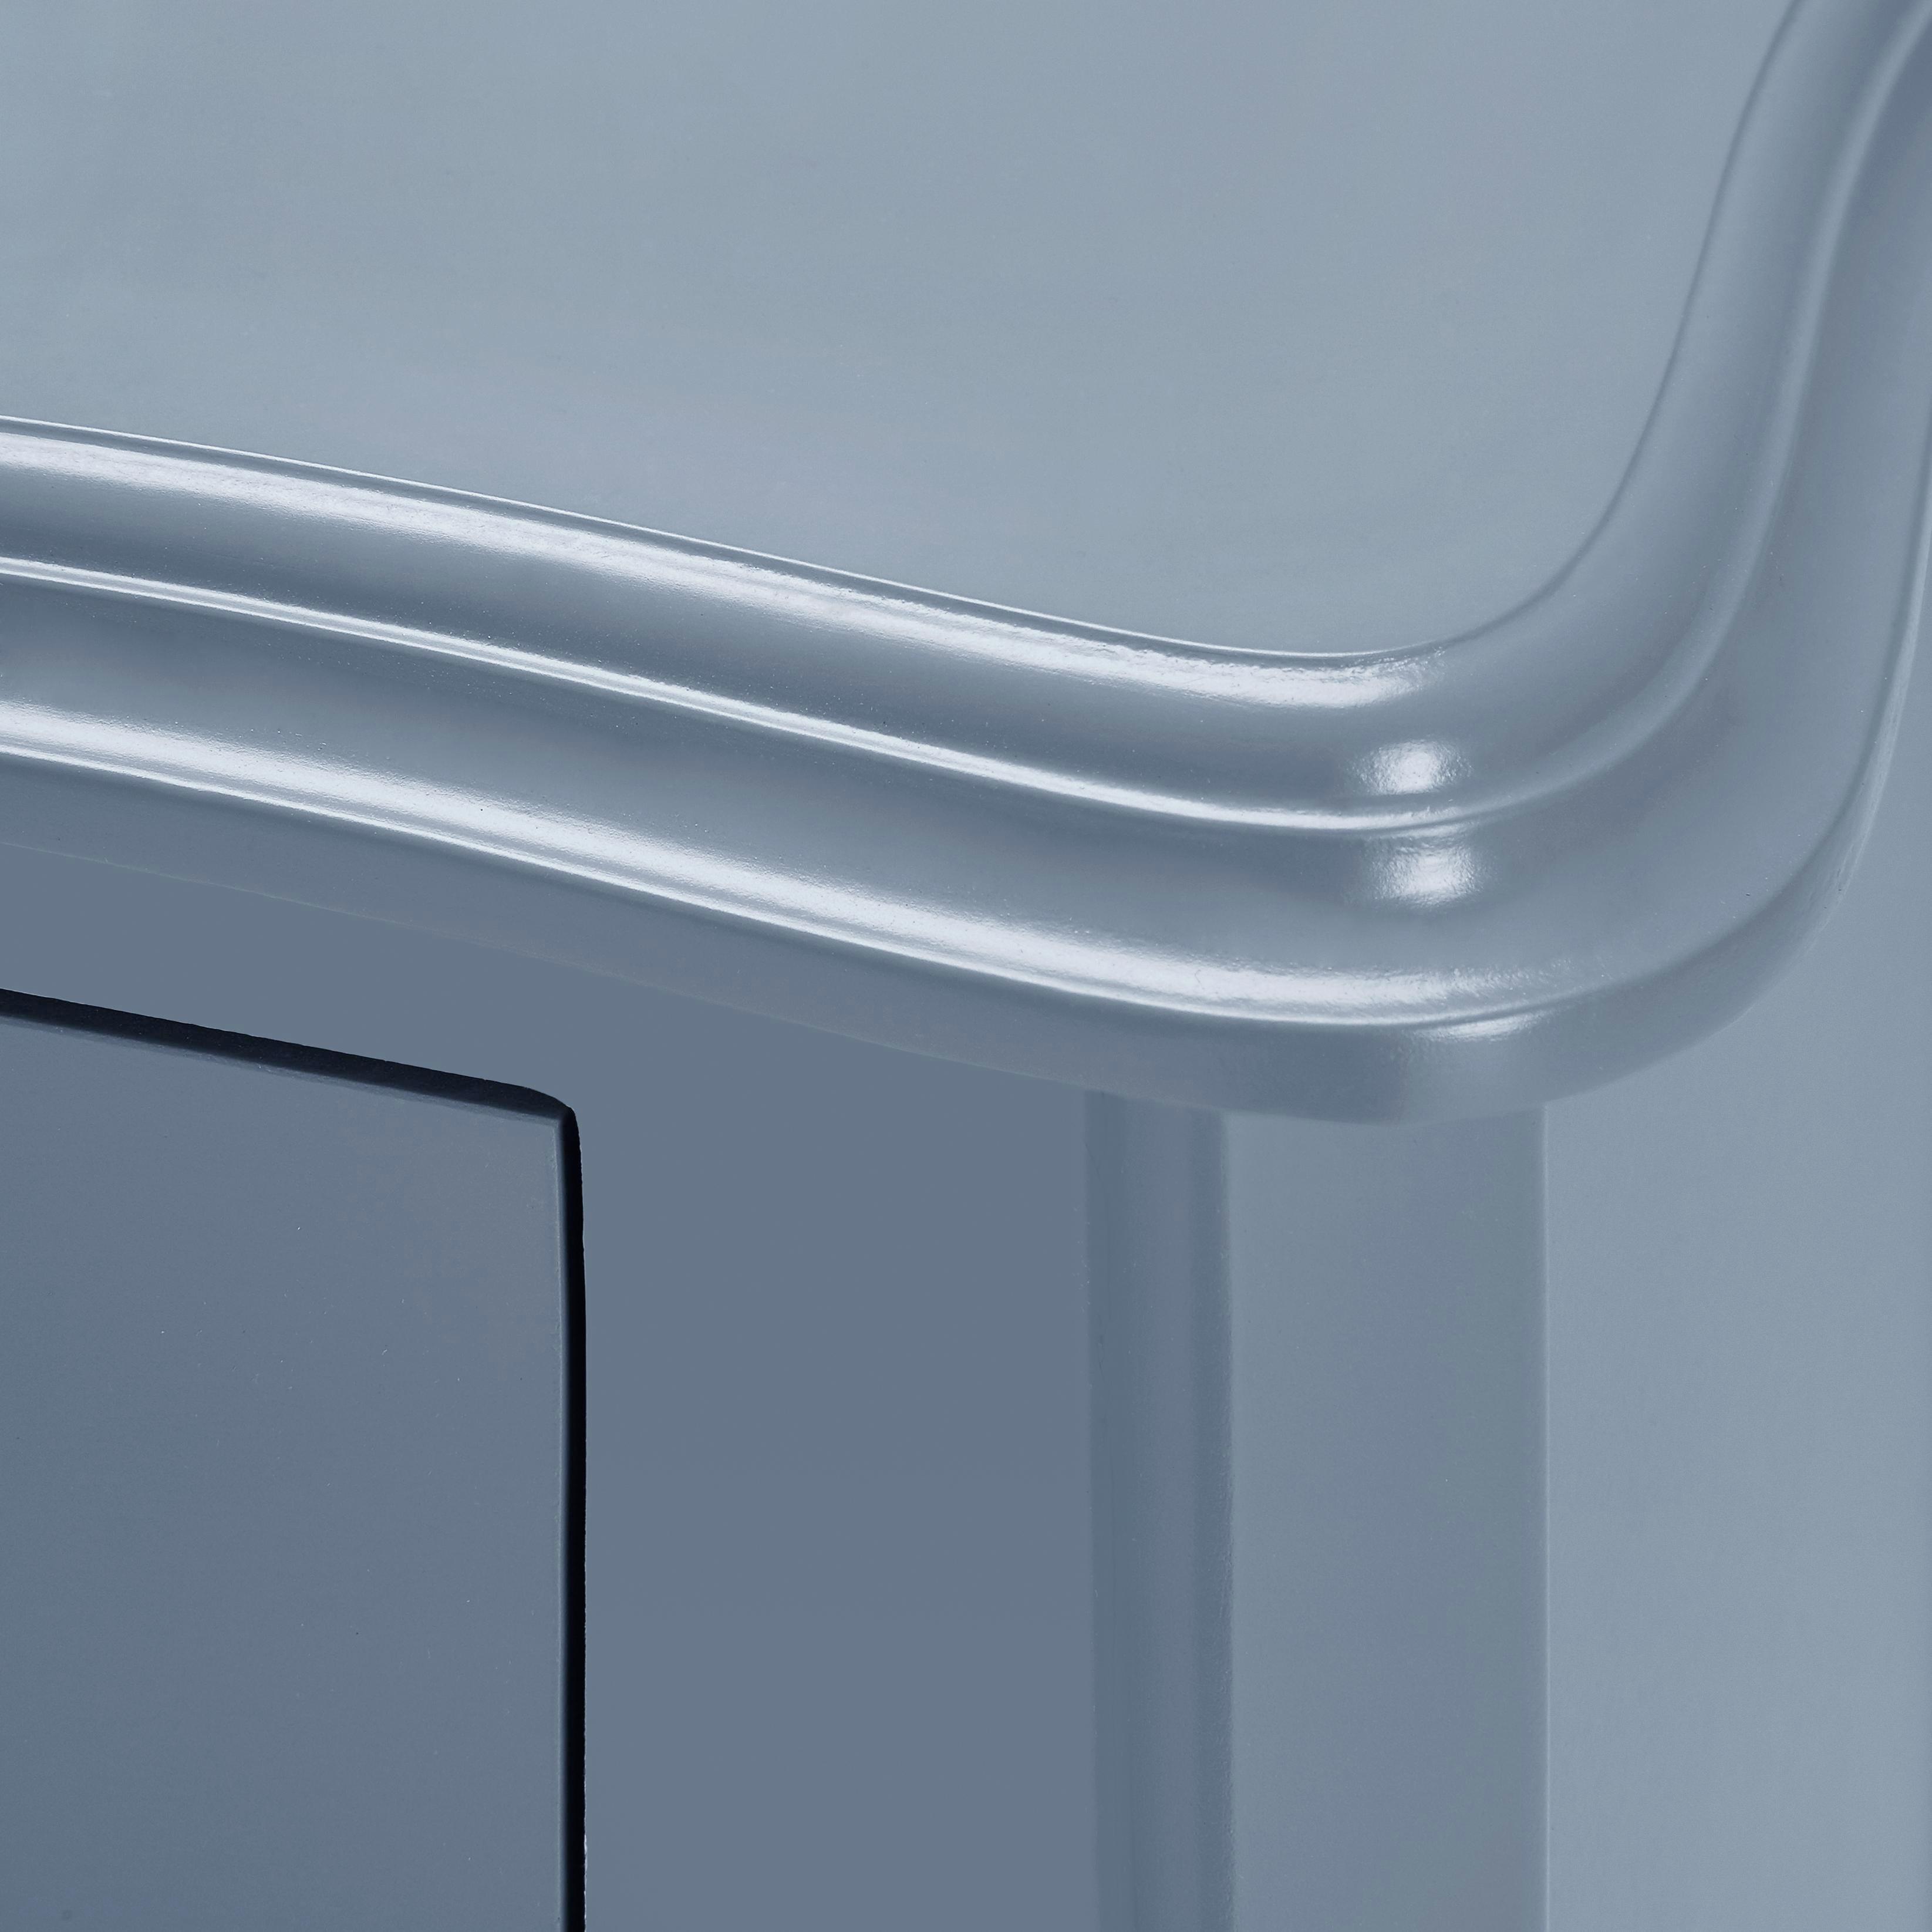 Nachtkästchen Guiseppe - Grau, MODERN, Holz (43/66/32cm) - MÖMAX modern living